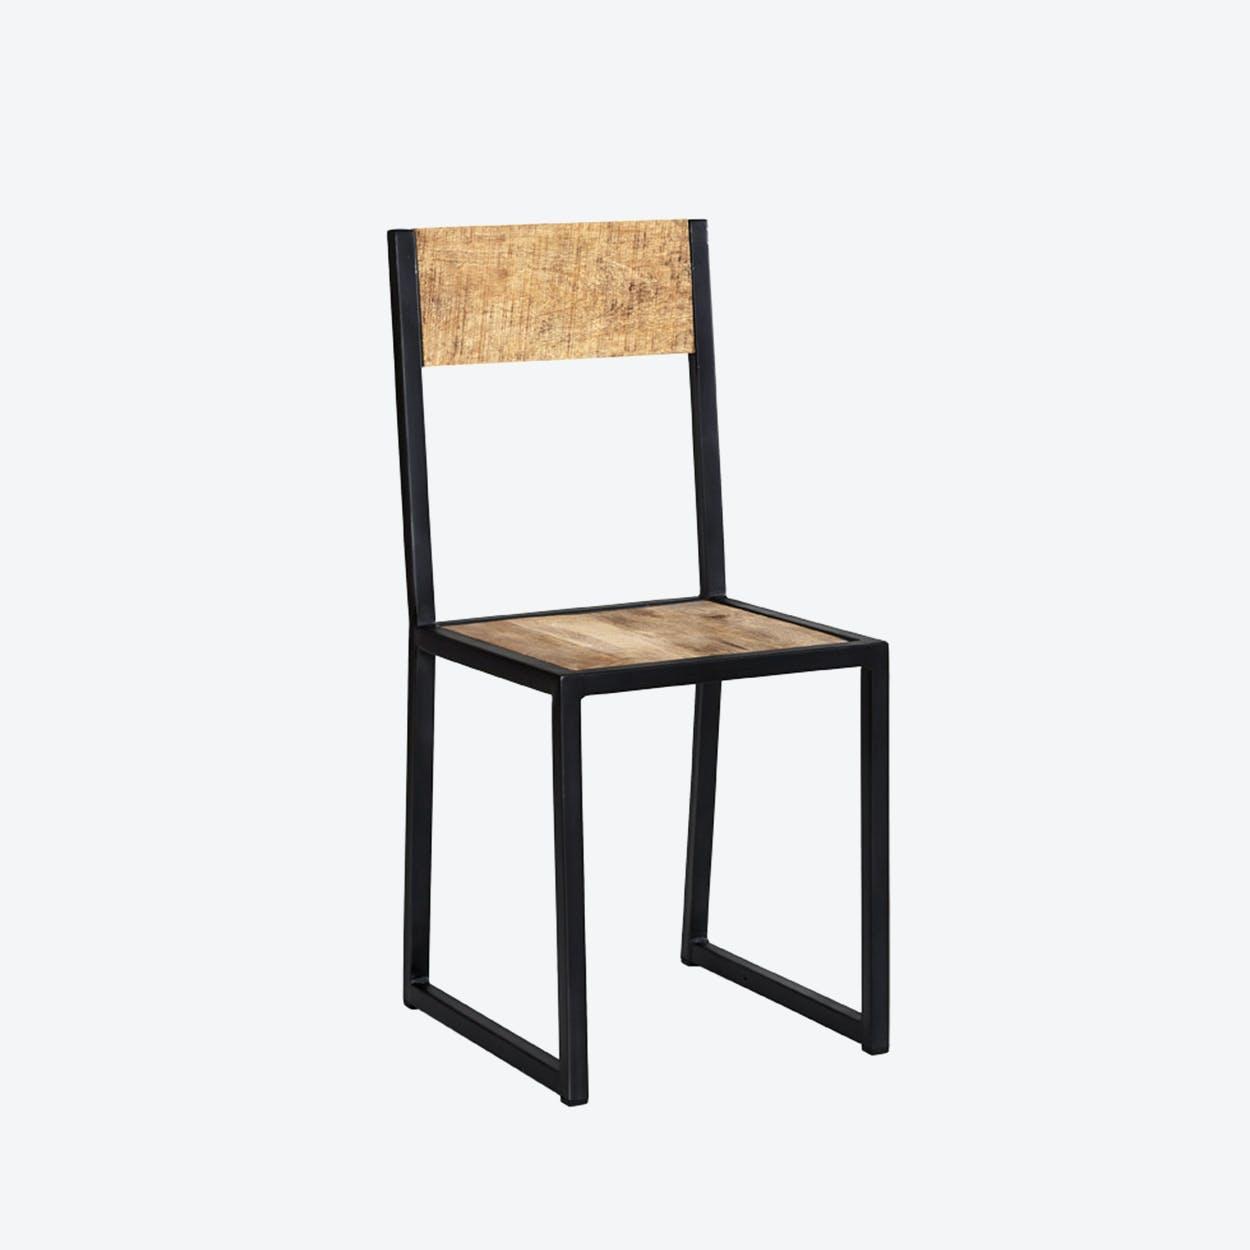 Mango Wood Metal & Wood Dining Chair